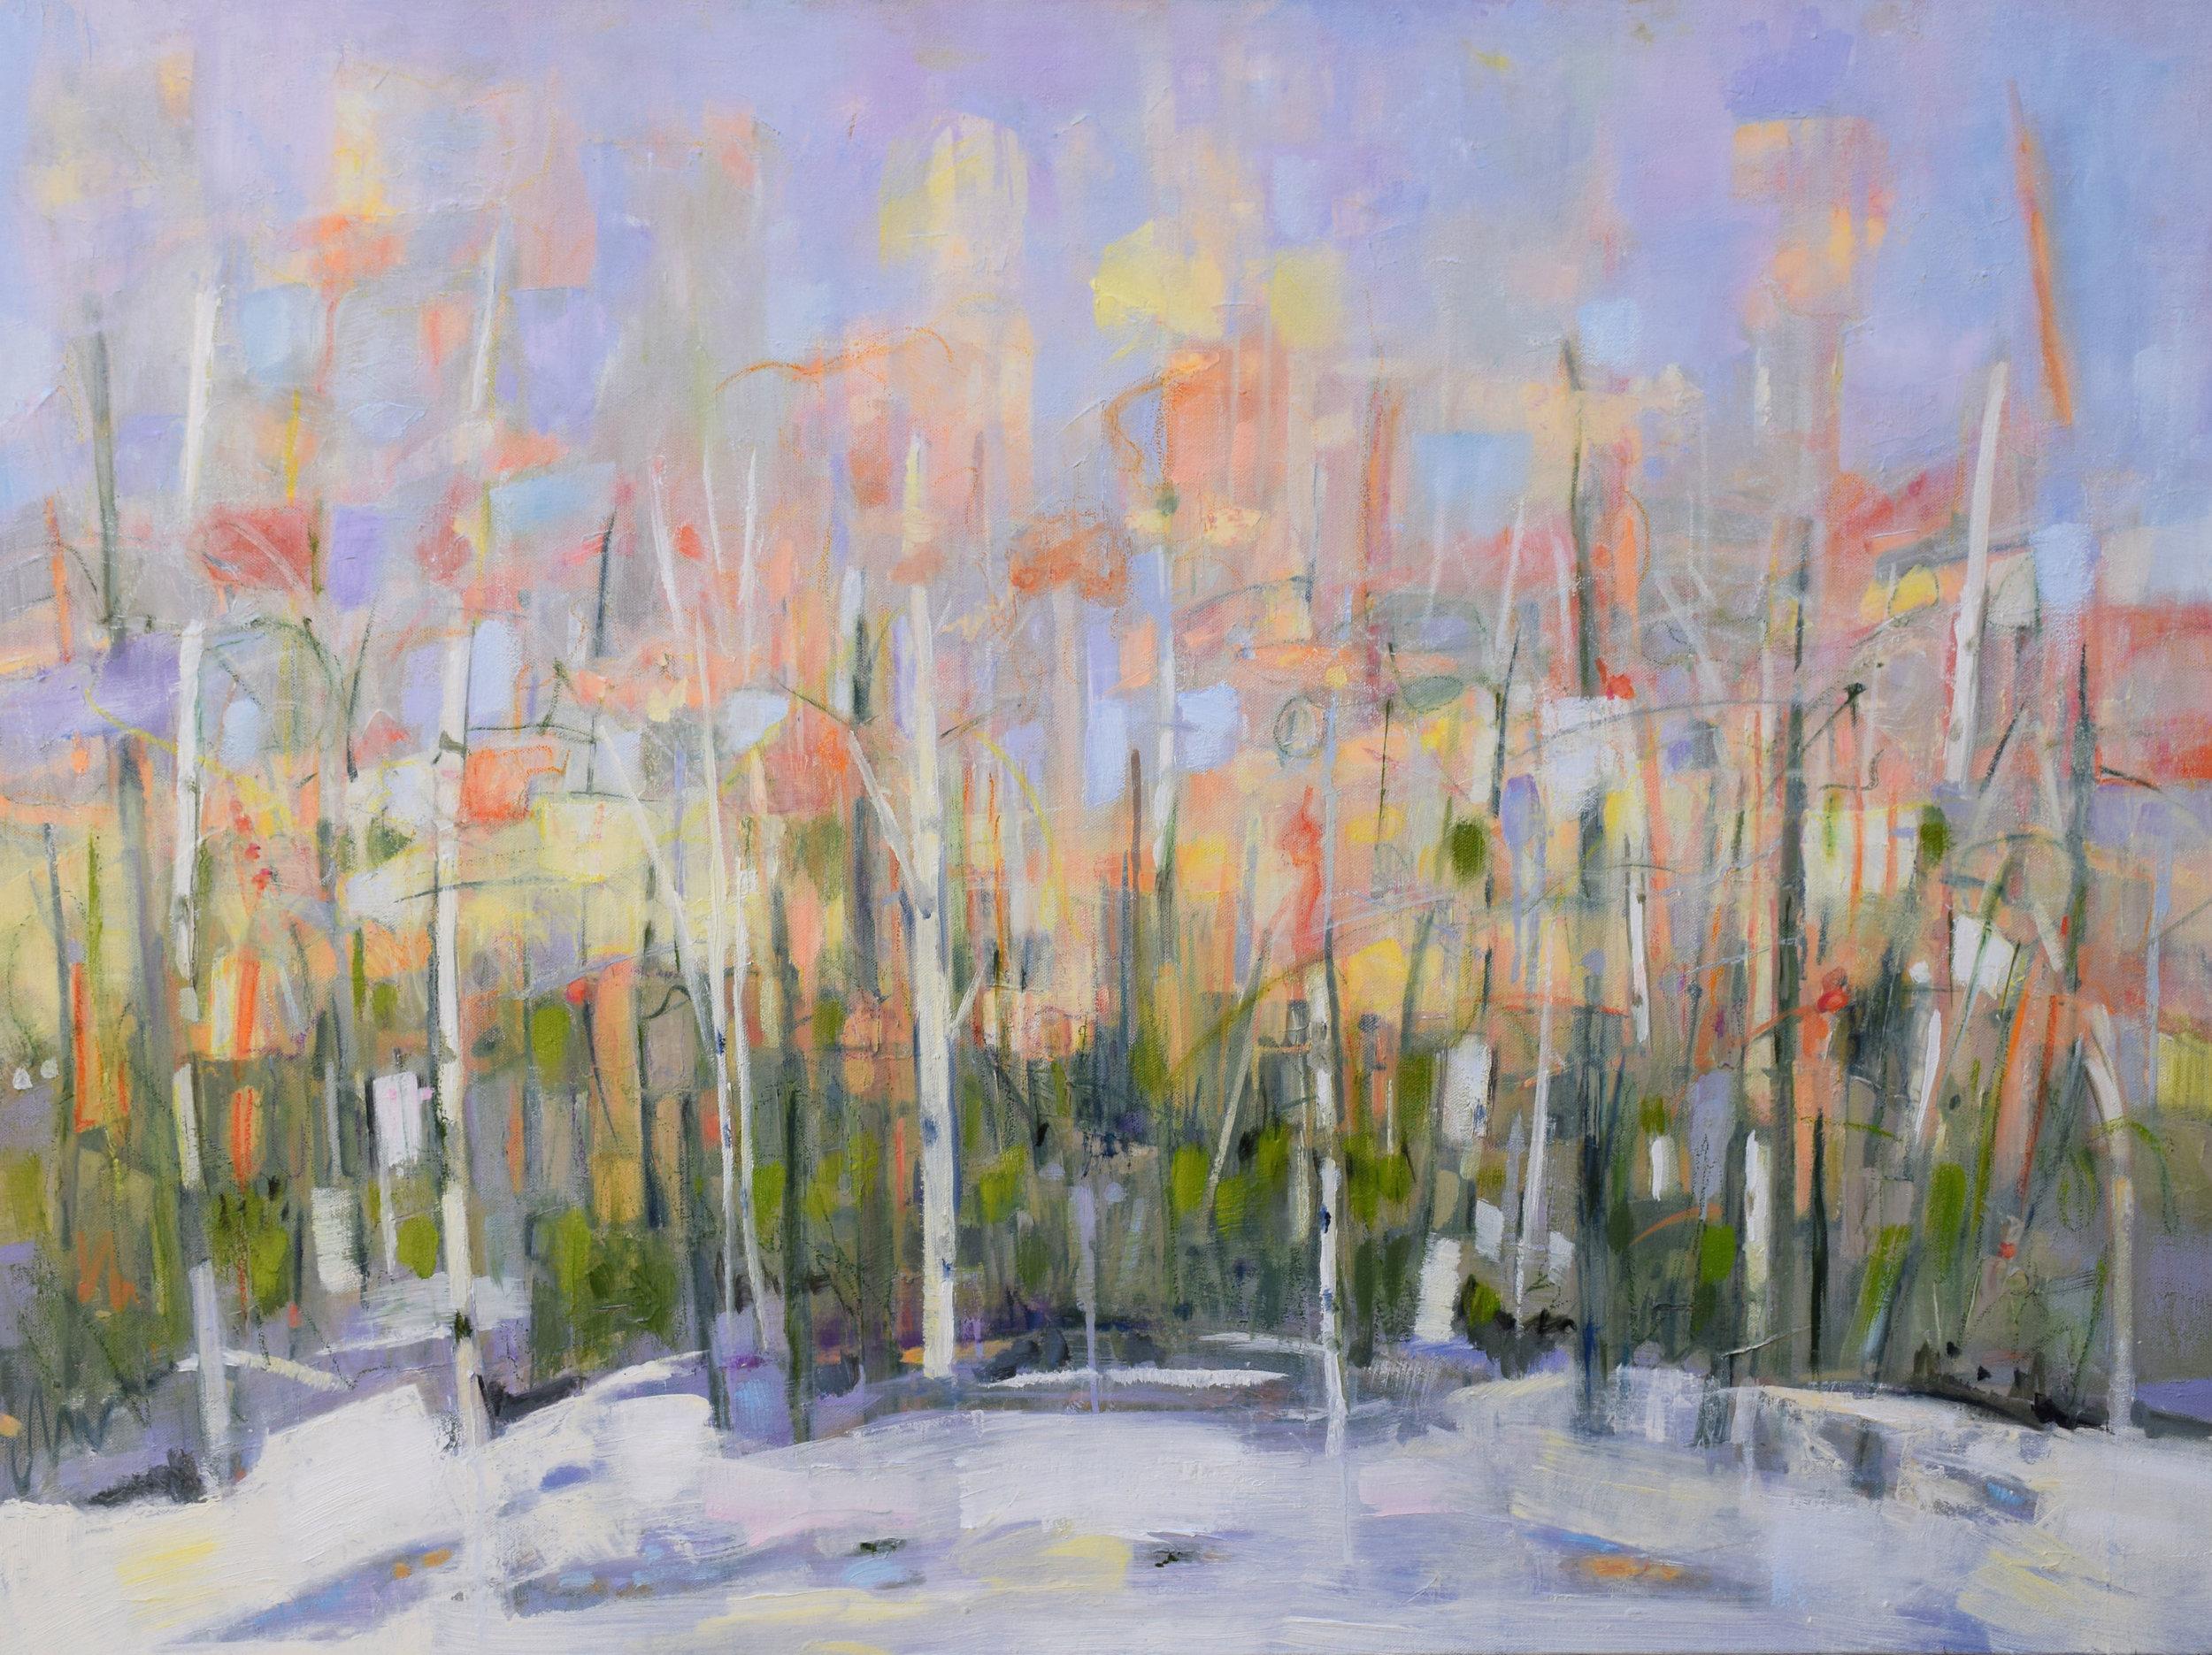 "#30 Winter - Virginia   Oil on Canvas  31"" x 41""  $2200   Click to Inquire"